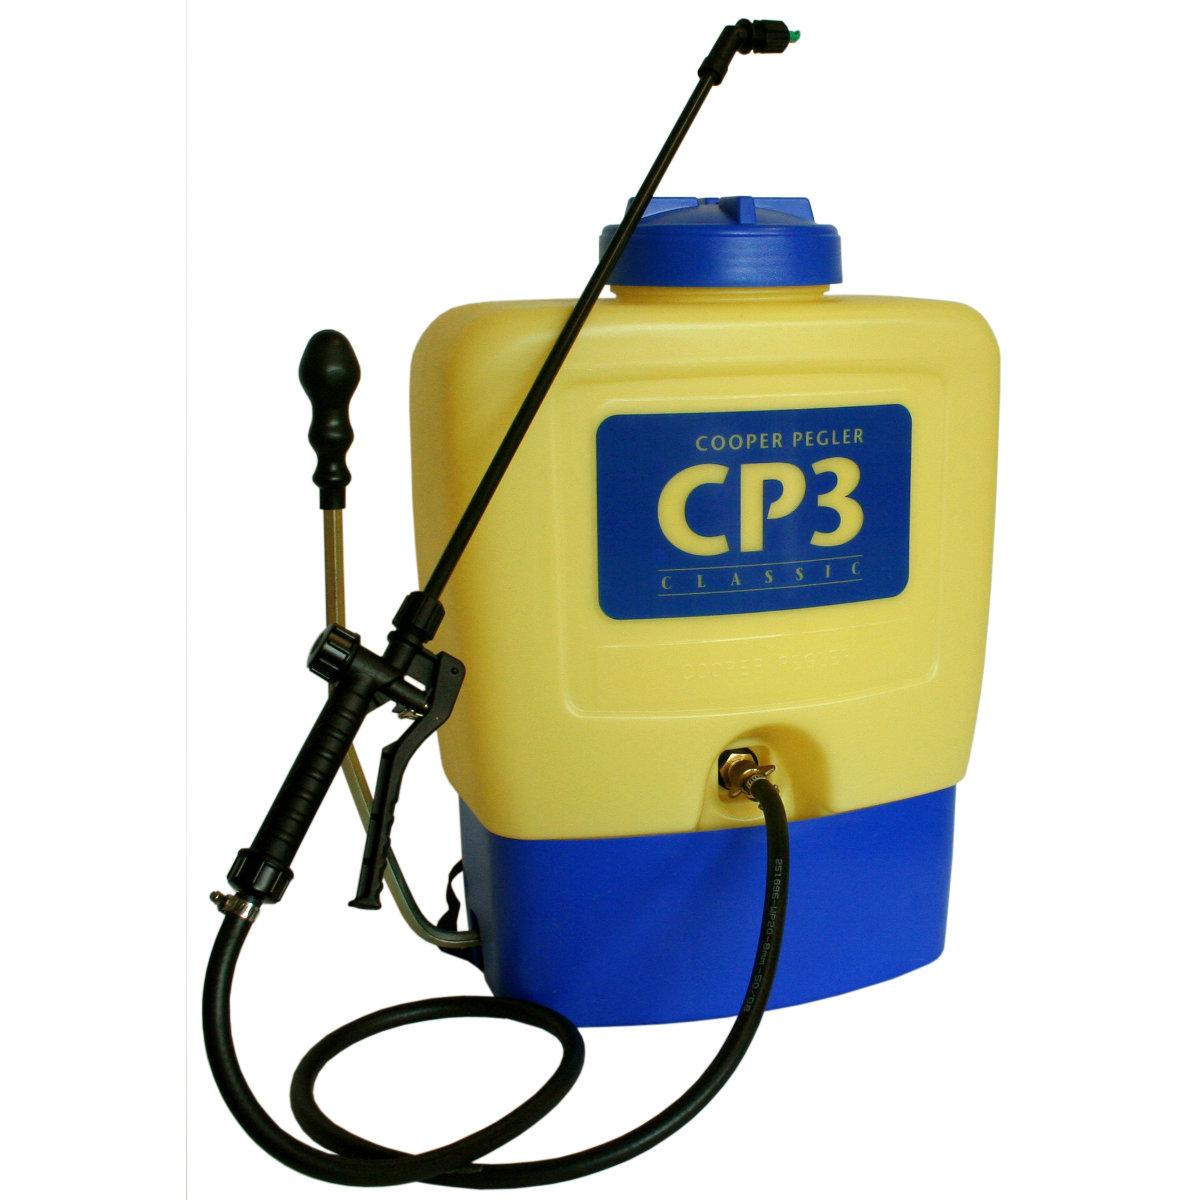 knapsock sprayer China knapsack sprayers catalog of 16 liters poly hand sprayer, knapsack manual sprayer, hand sprayer (uq-16i-i) provided by china manufacturer - nantong unique machinery science & technology co, ltd, page1.